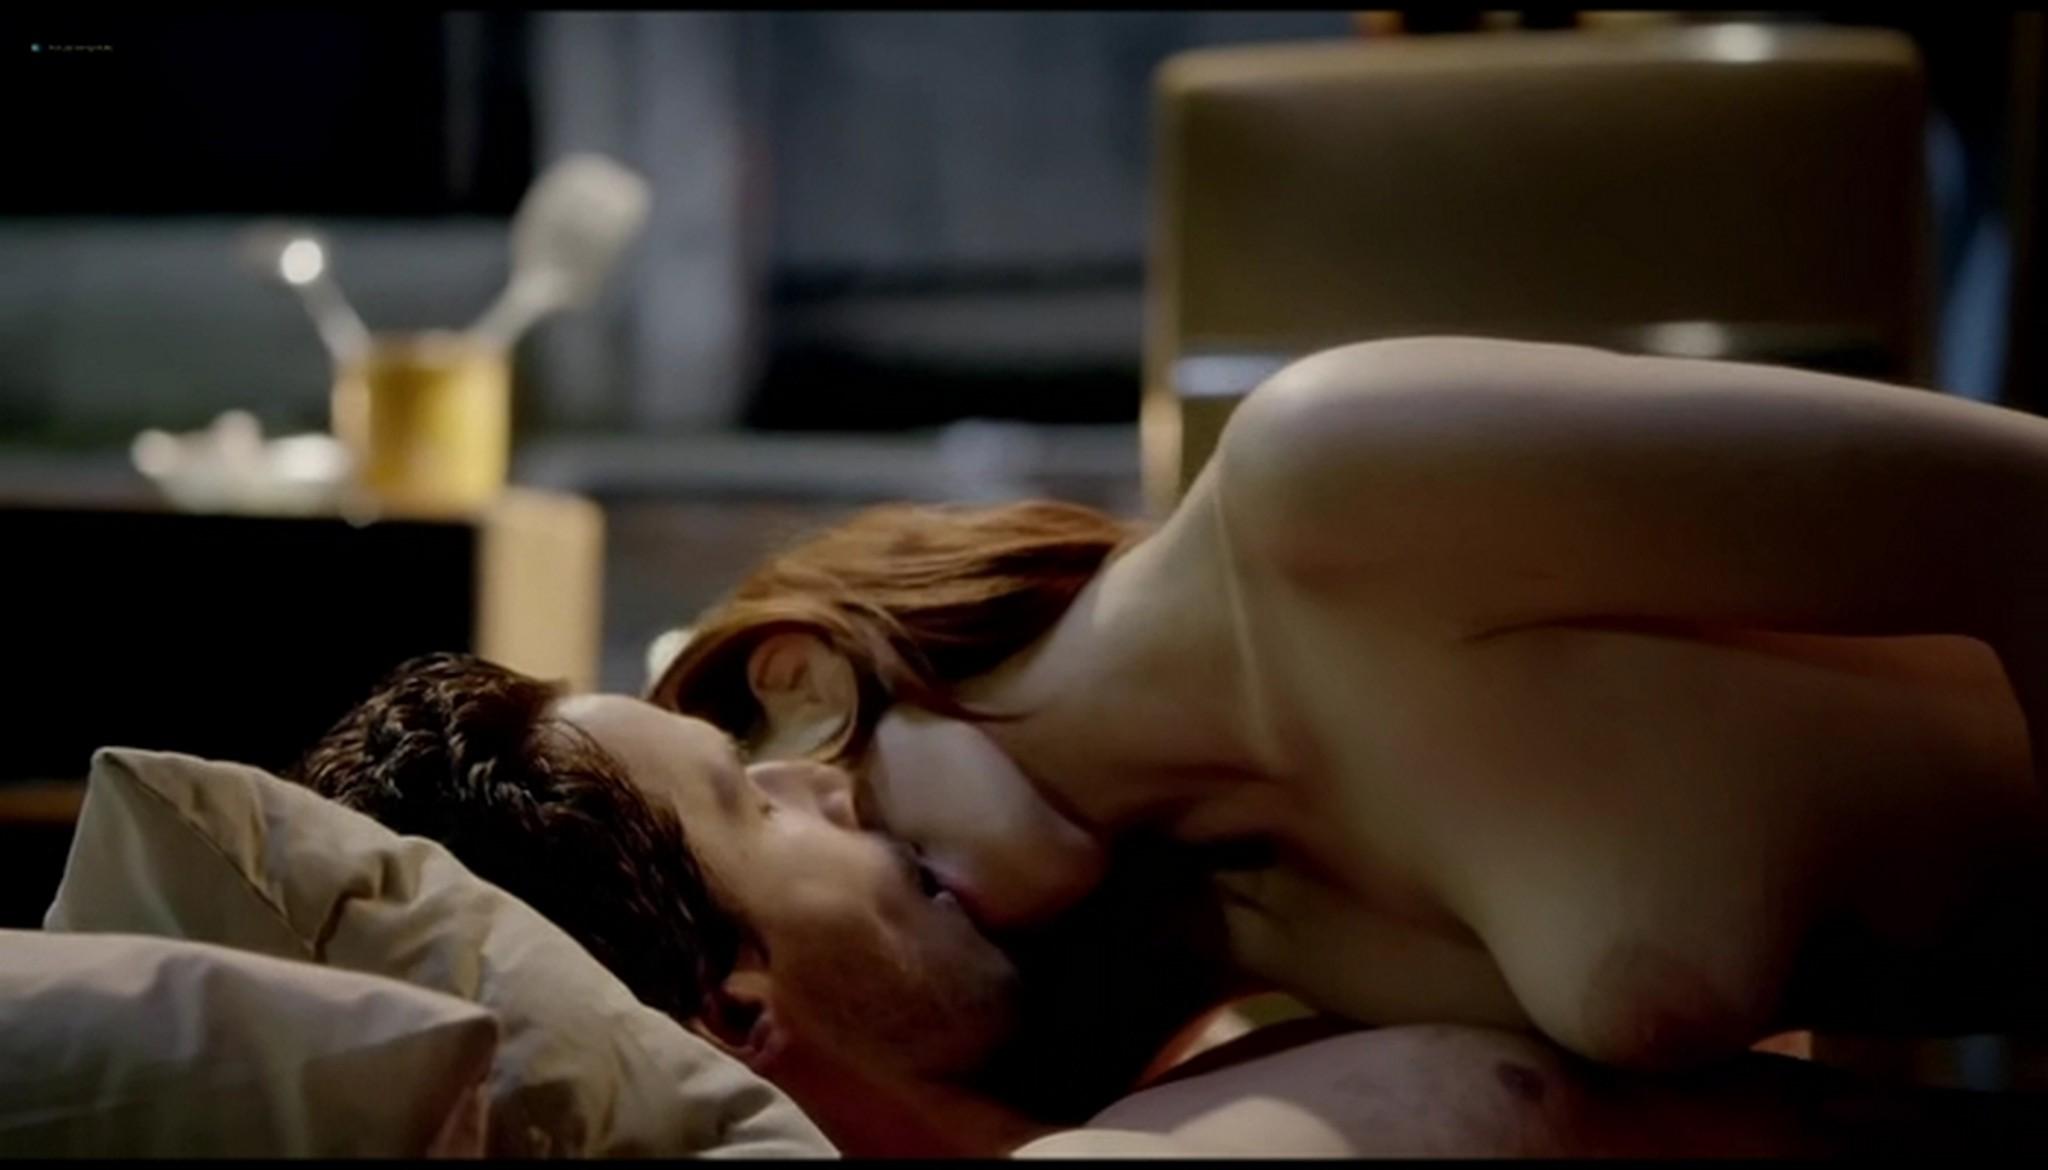 Diana Gettinger nude sex Moniqua Plante nude lesbian - Femme Fatales (2012) s2e2 - Gun Twisted (10)